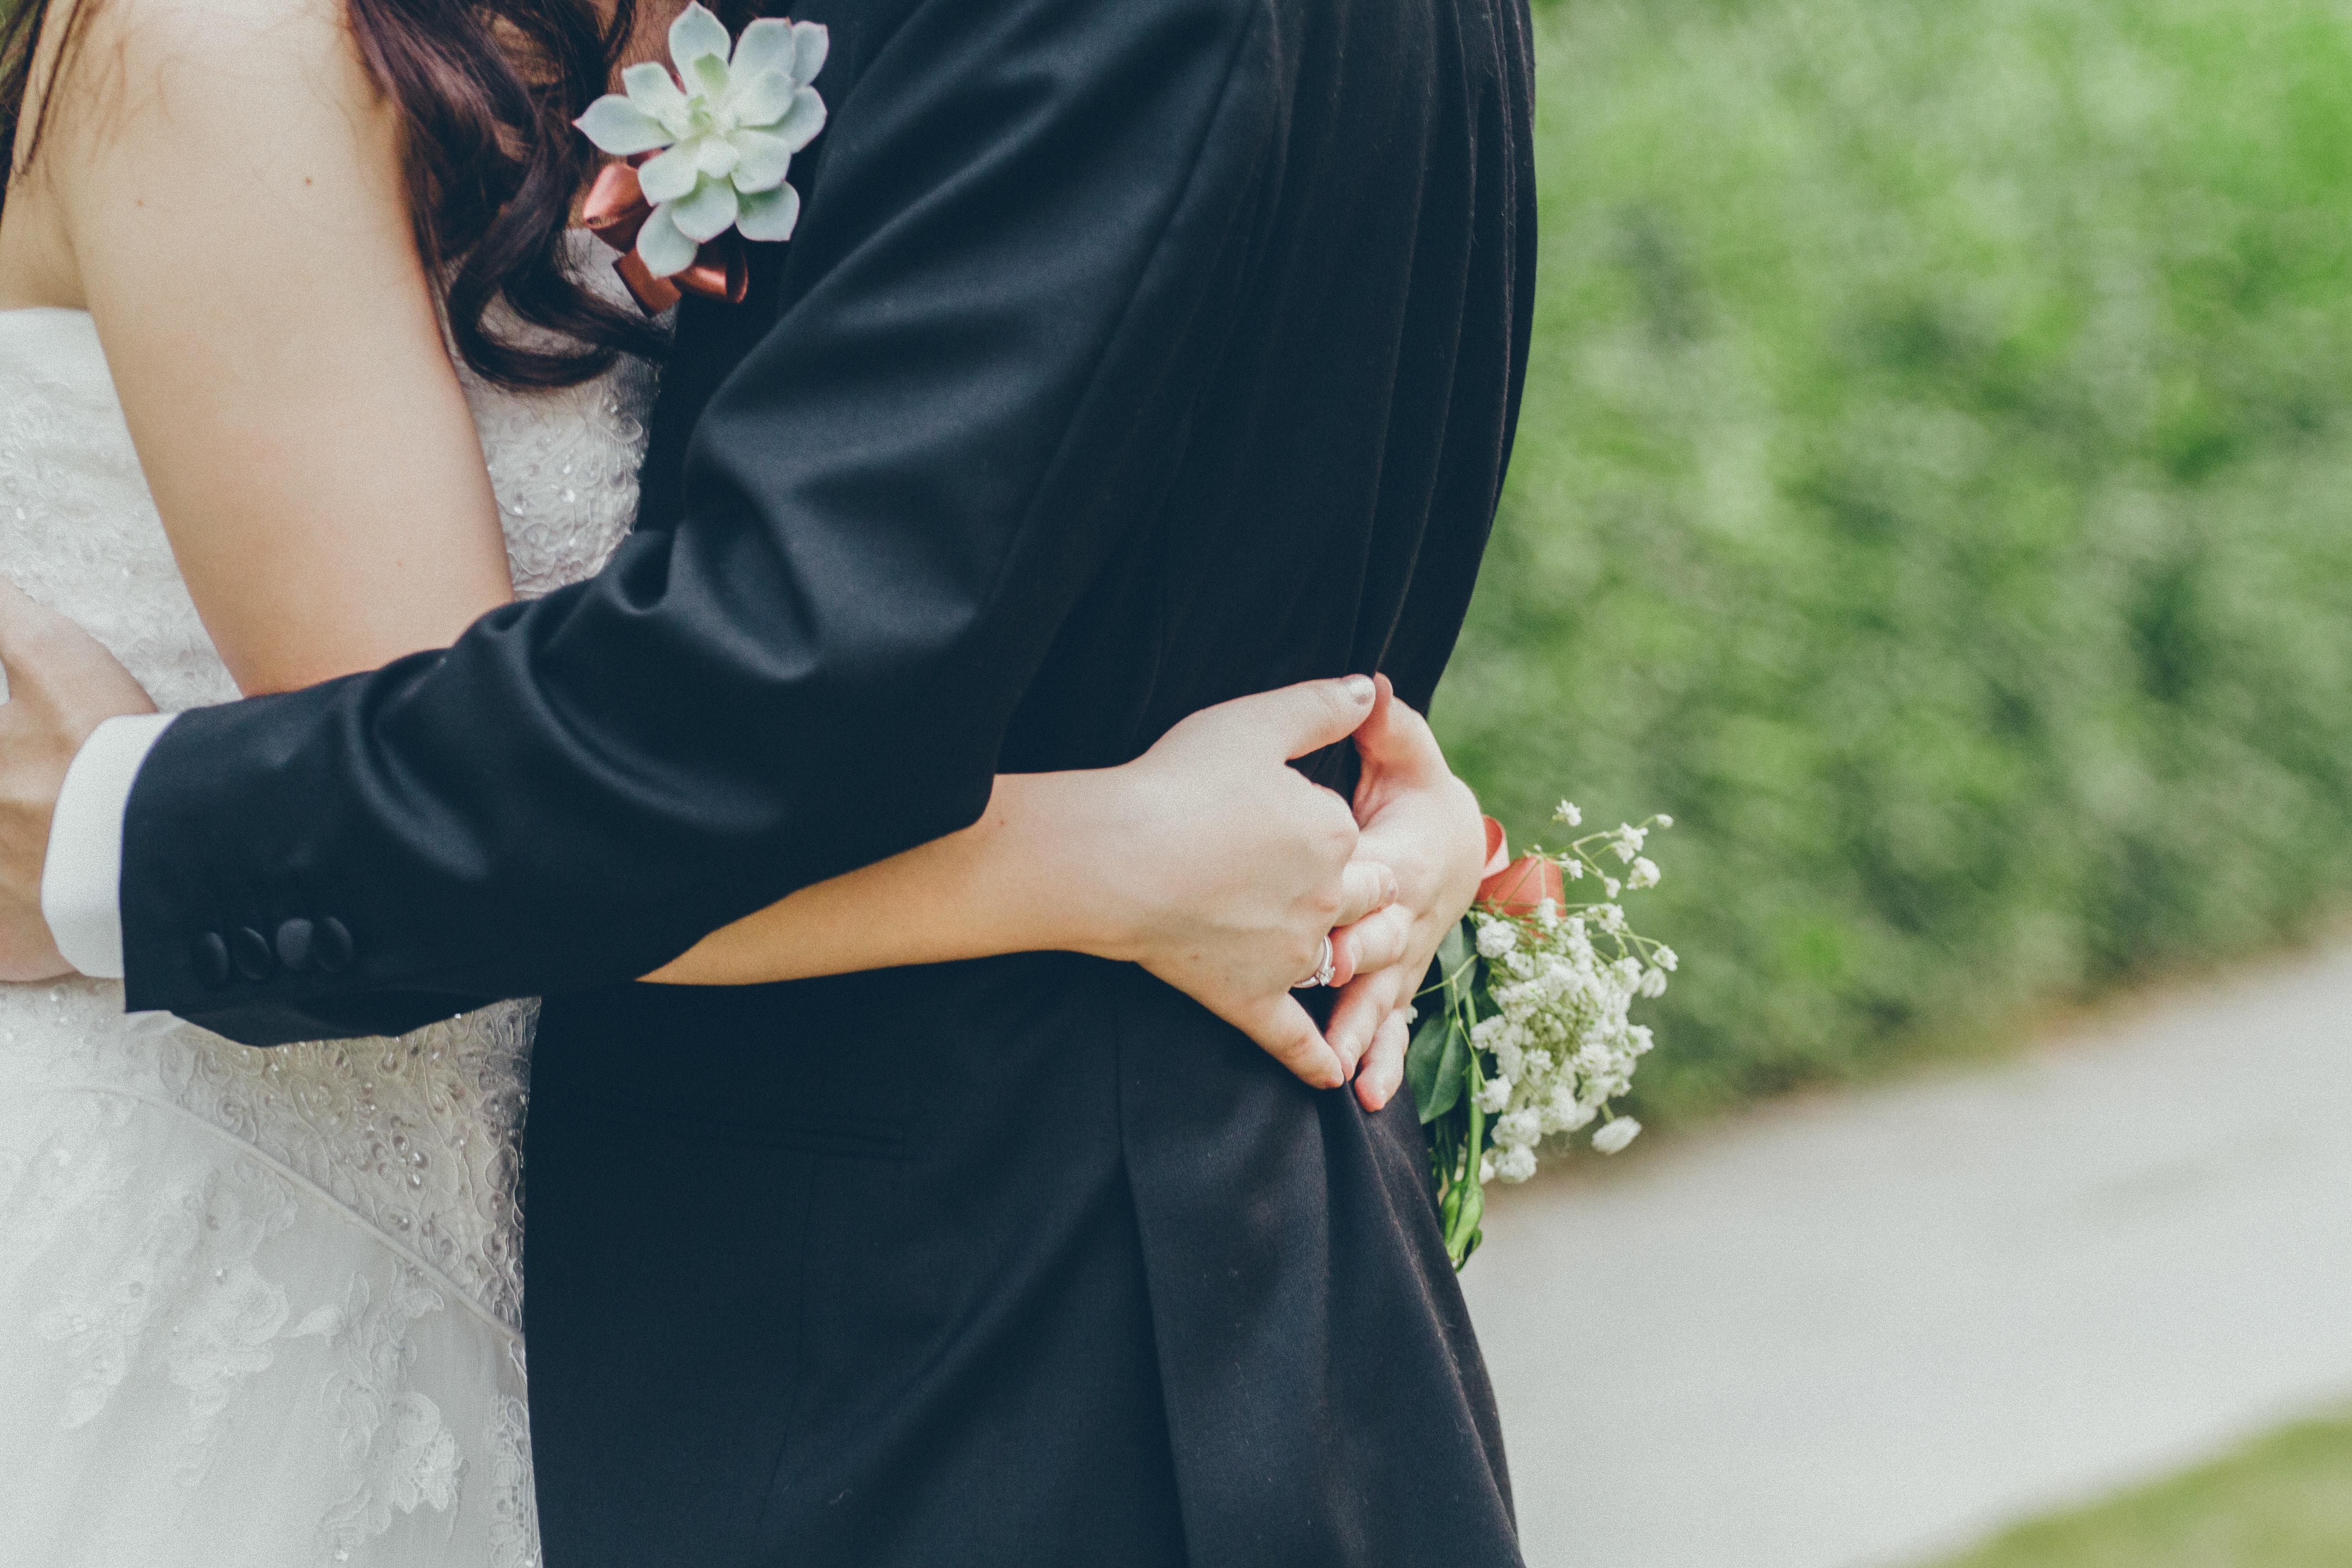 affection-blur-bridal-1023233